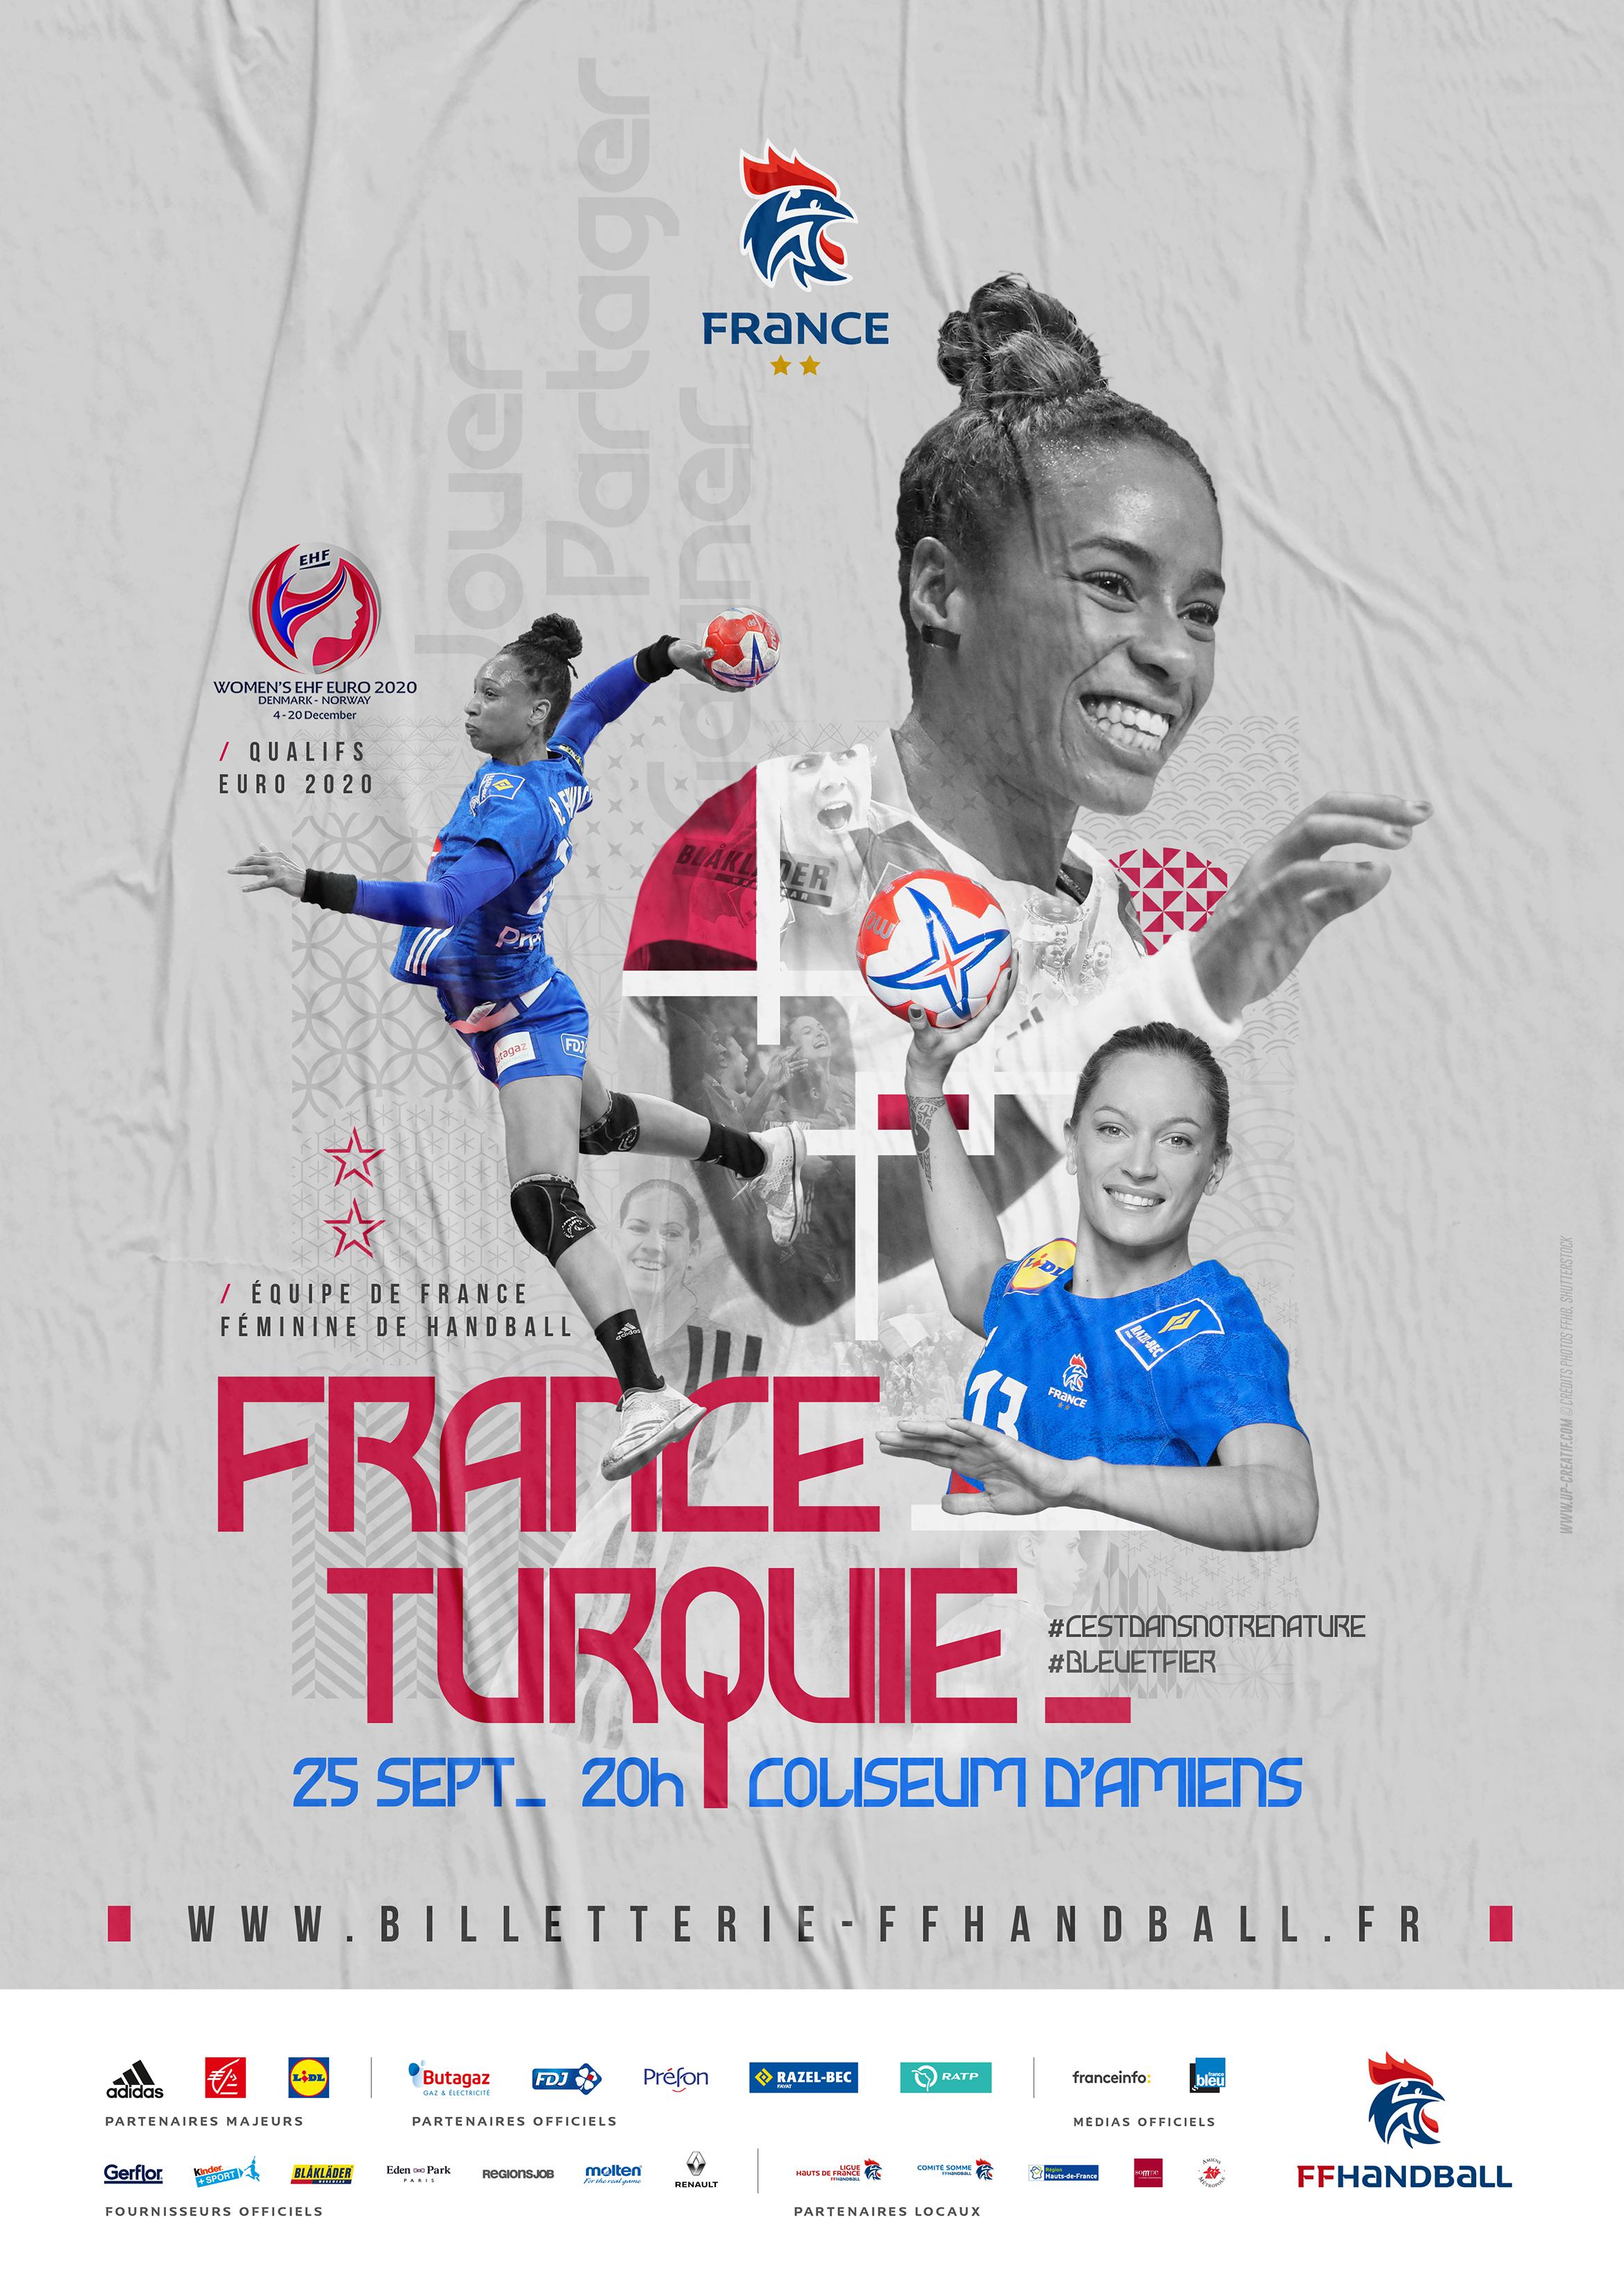 FFHB_QualifsEuro2020_FRATUR